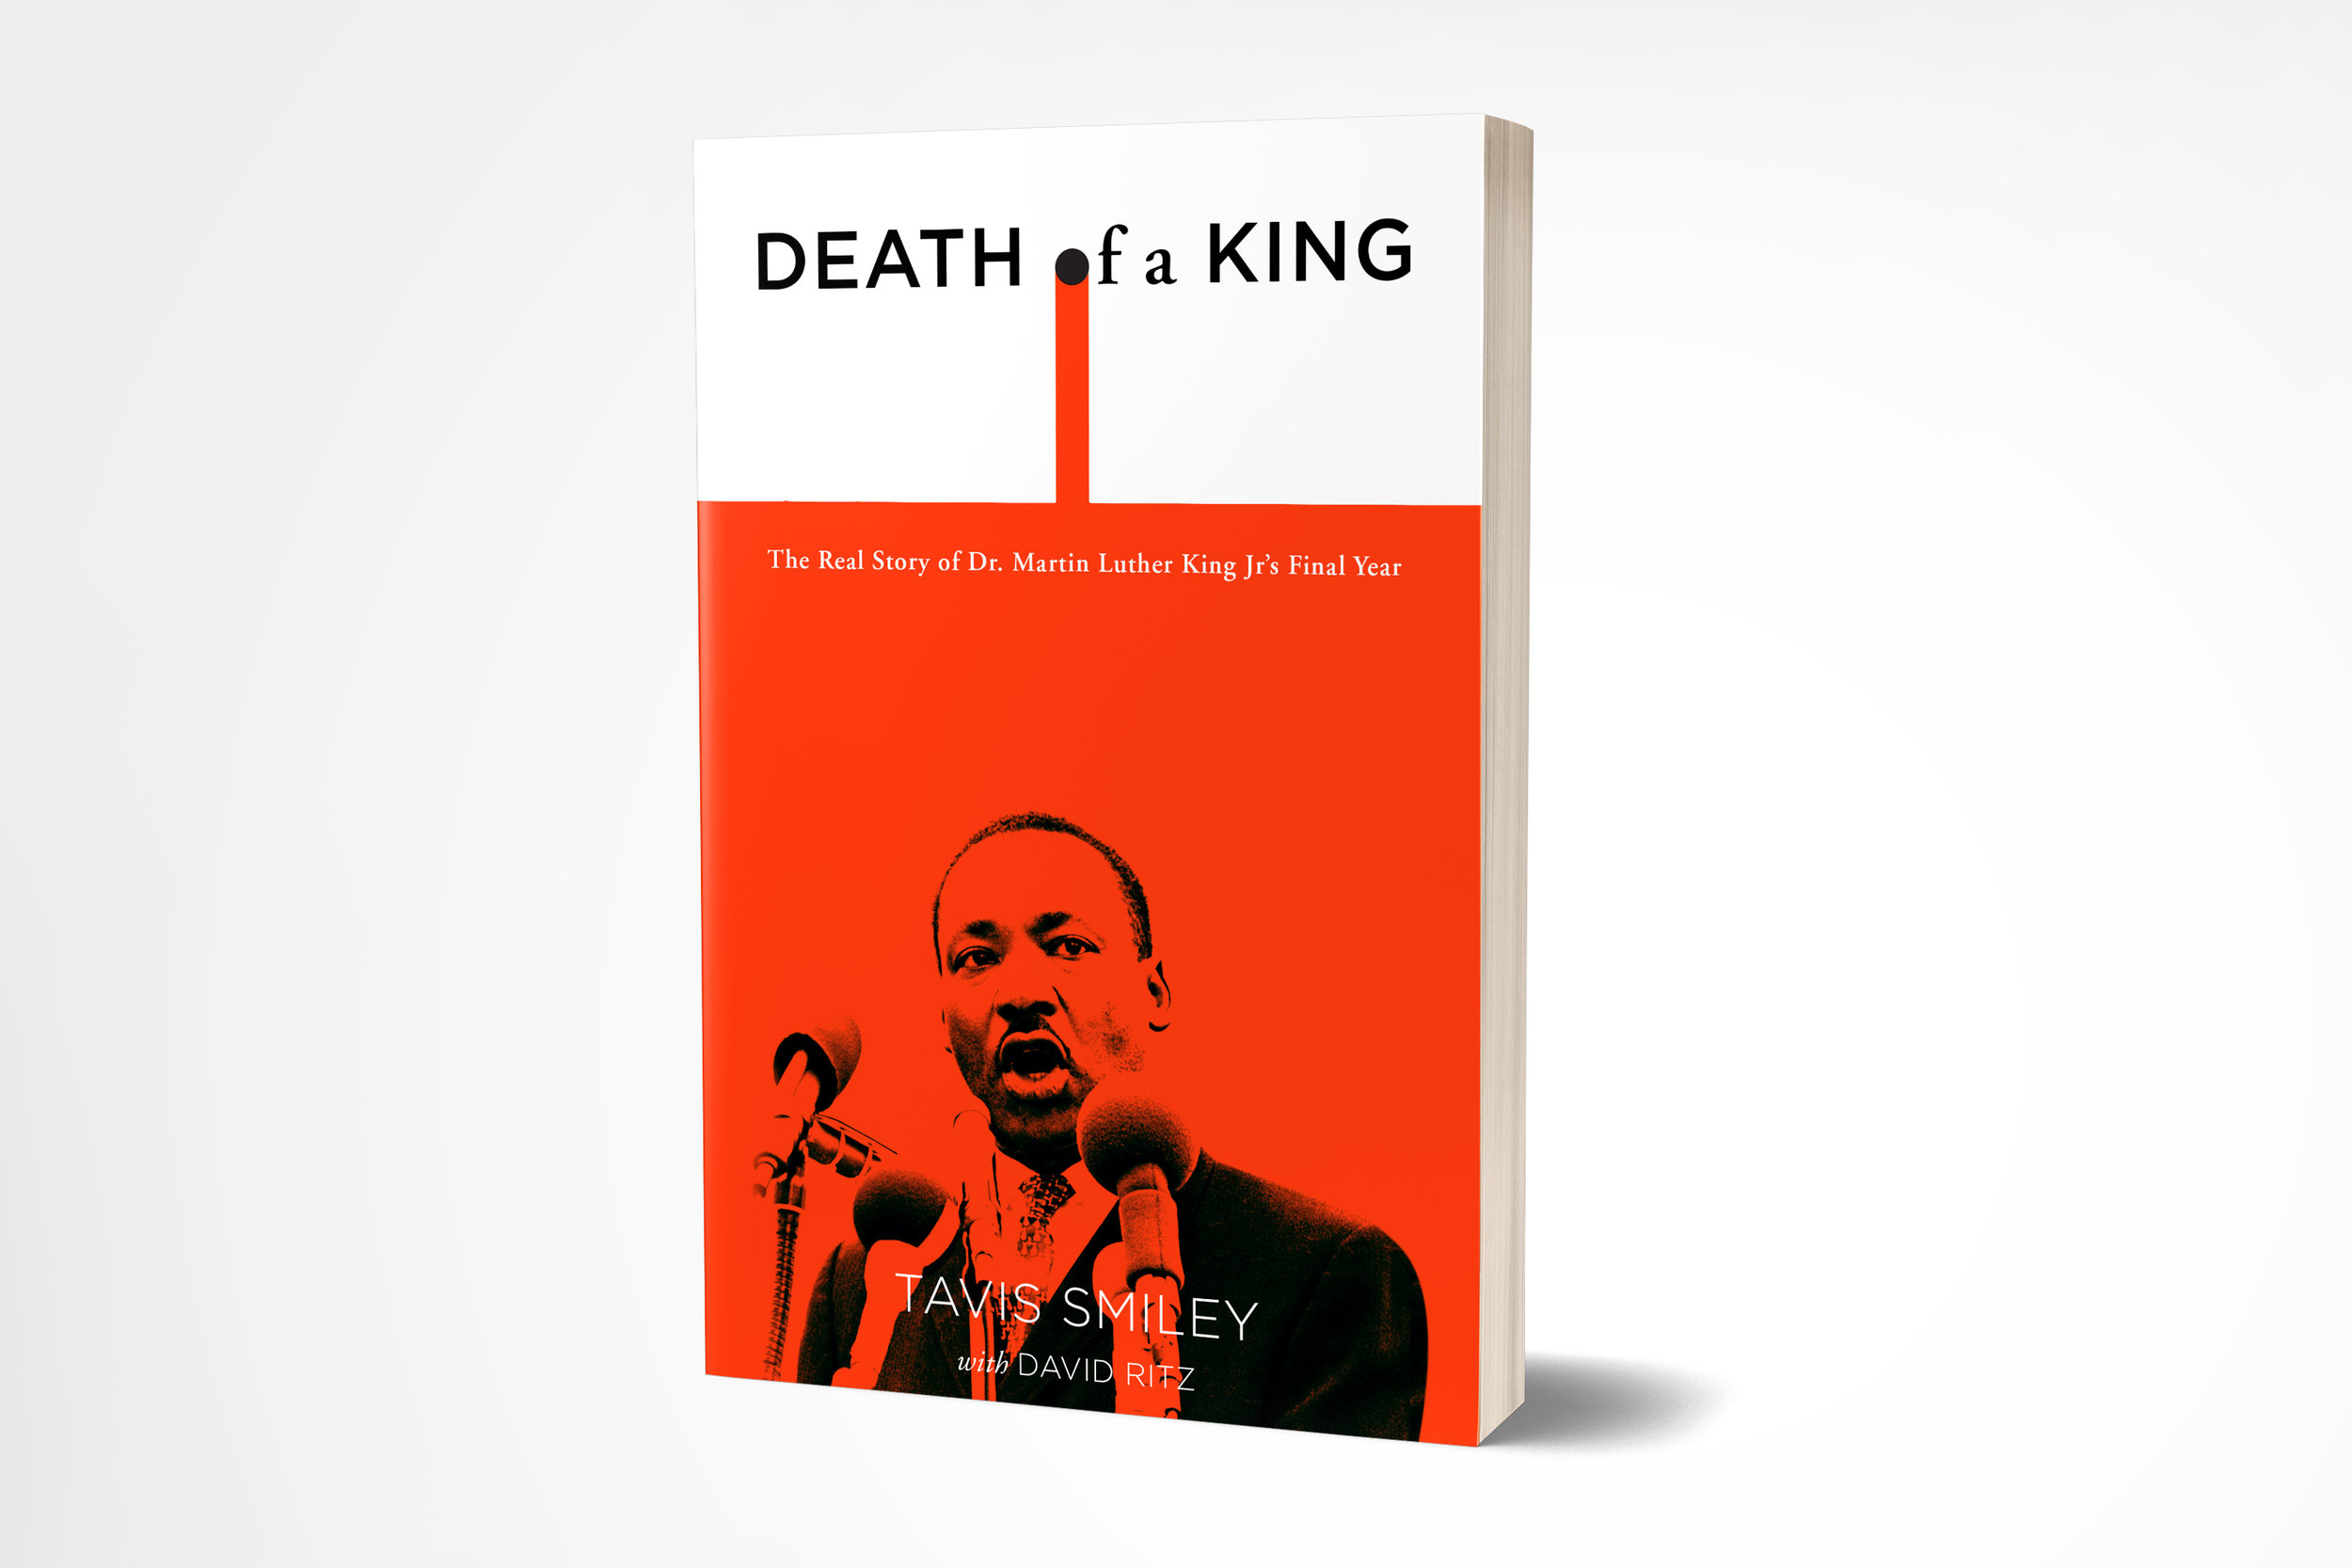 MLK_deathofaking_cover.jpg